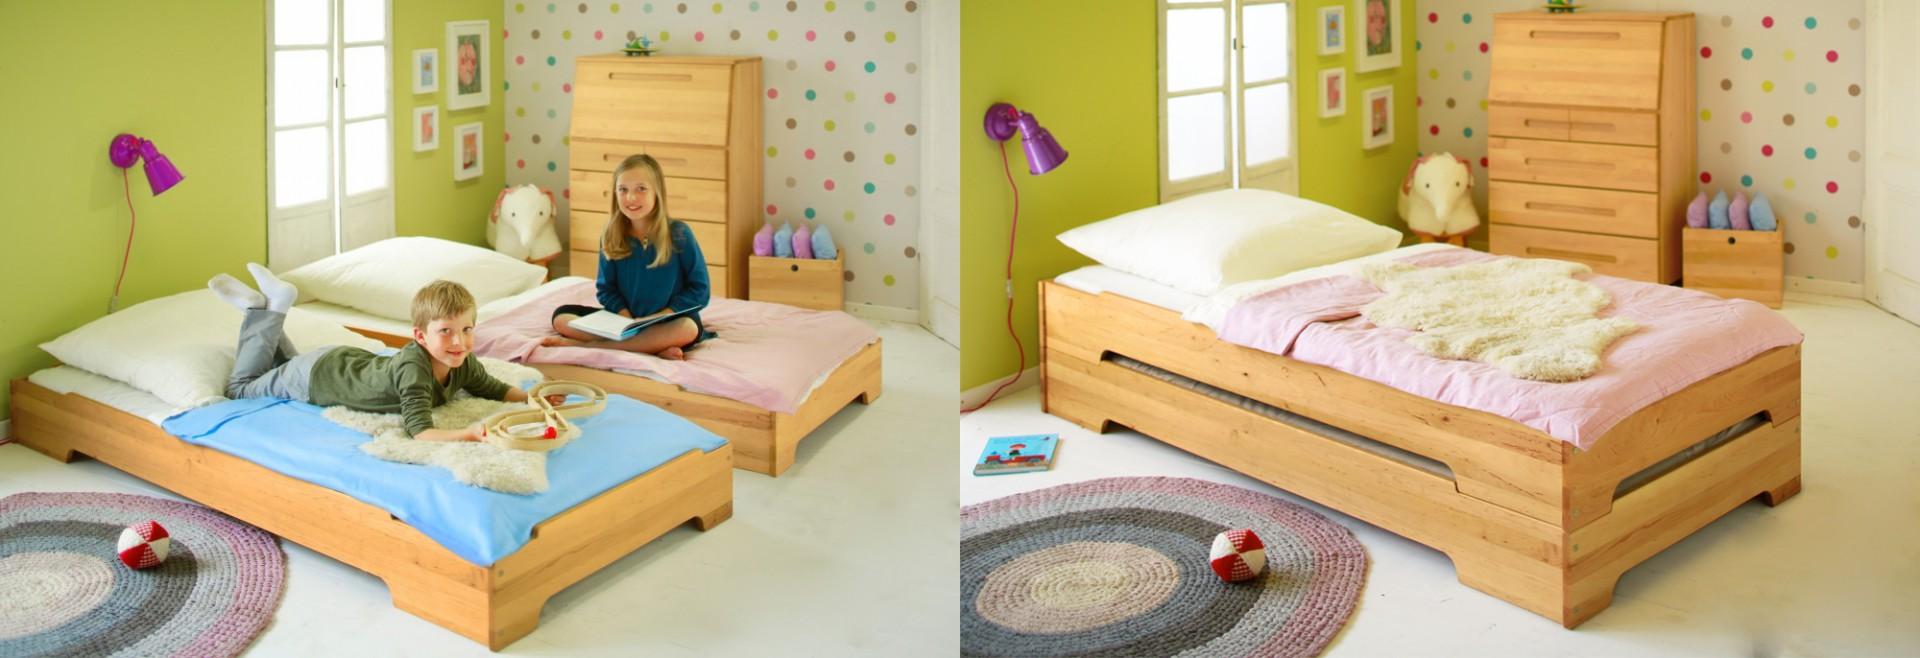 biokinder 2er set kai stapelbett mit roll lattenroste 90x200 cm erle. Black Bedroom Furniture Sets. Home Design Ideas